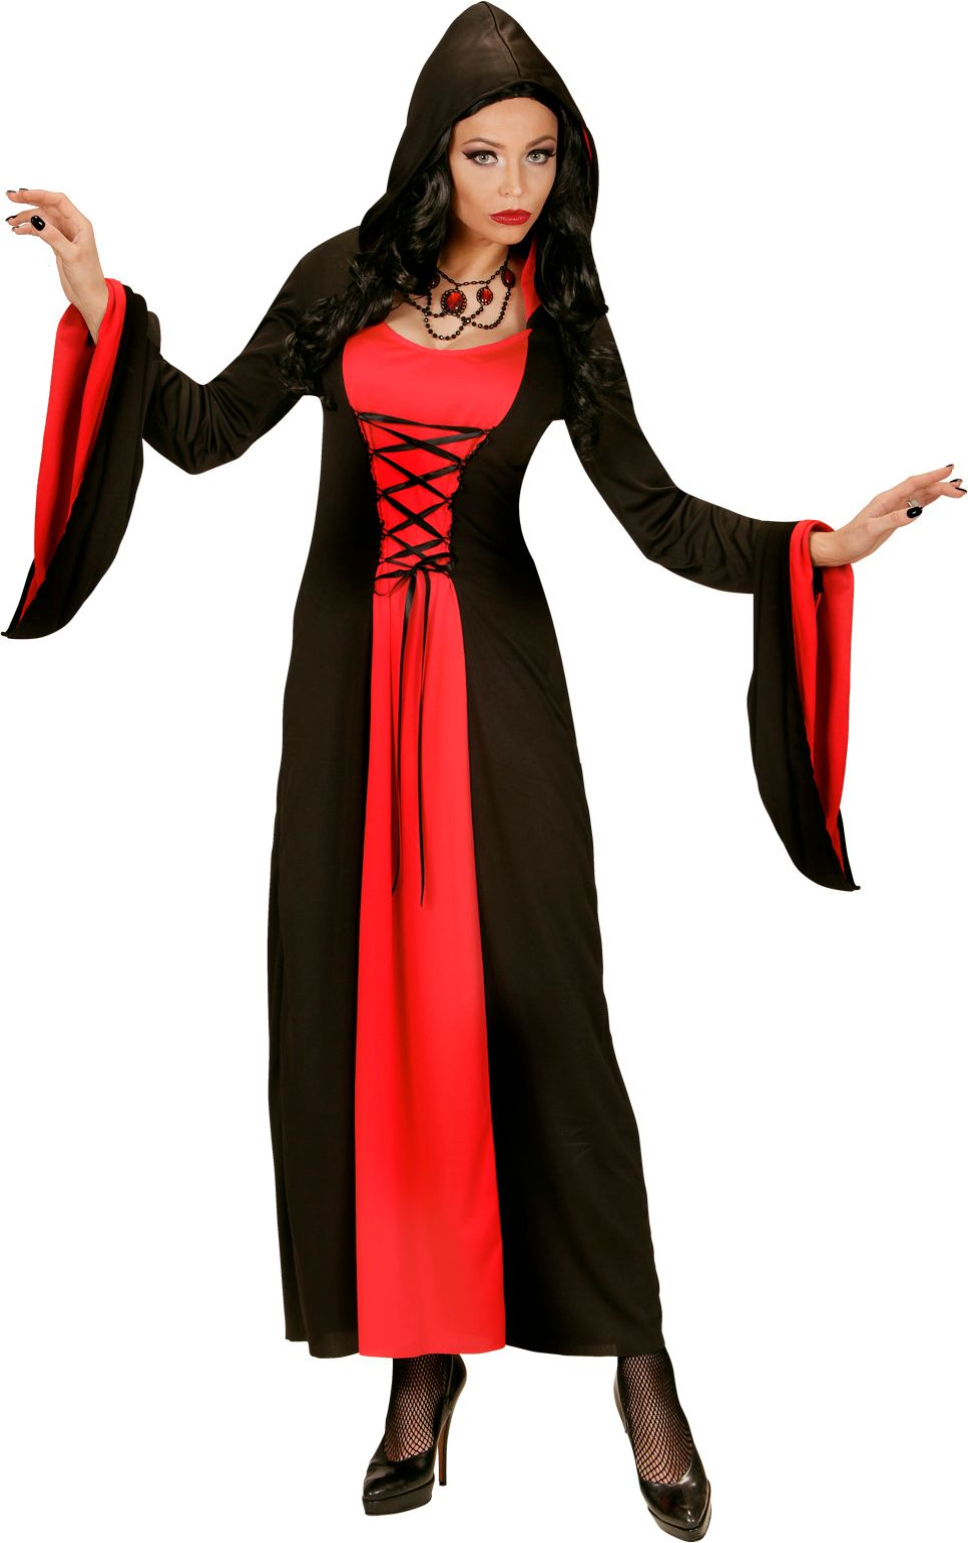 Gotische zwart rode jurk